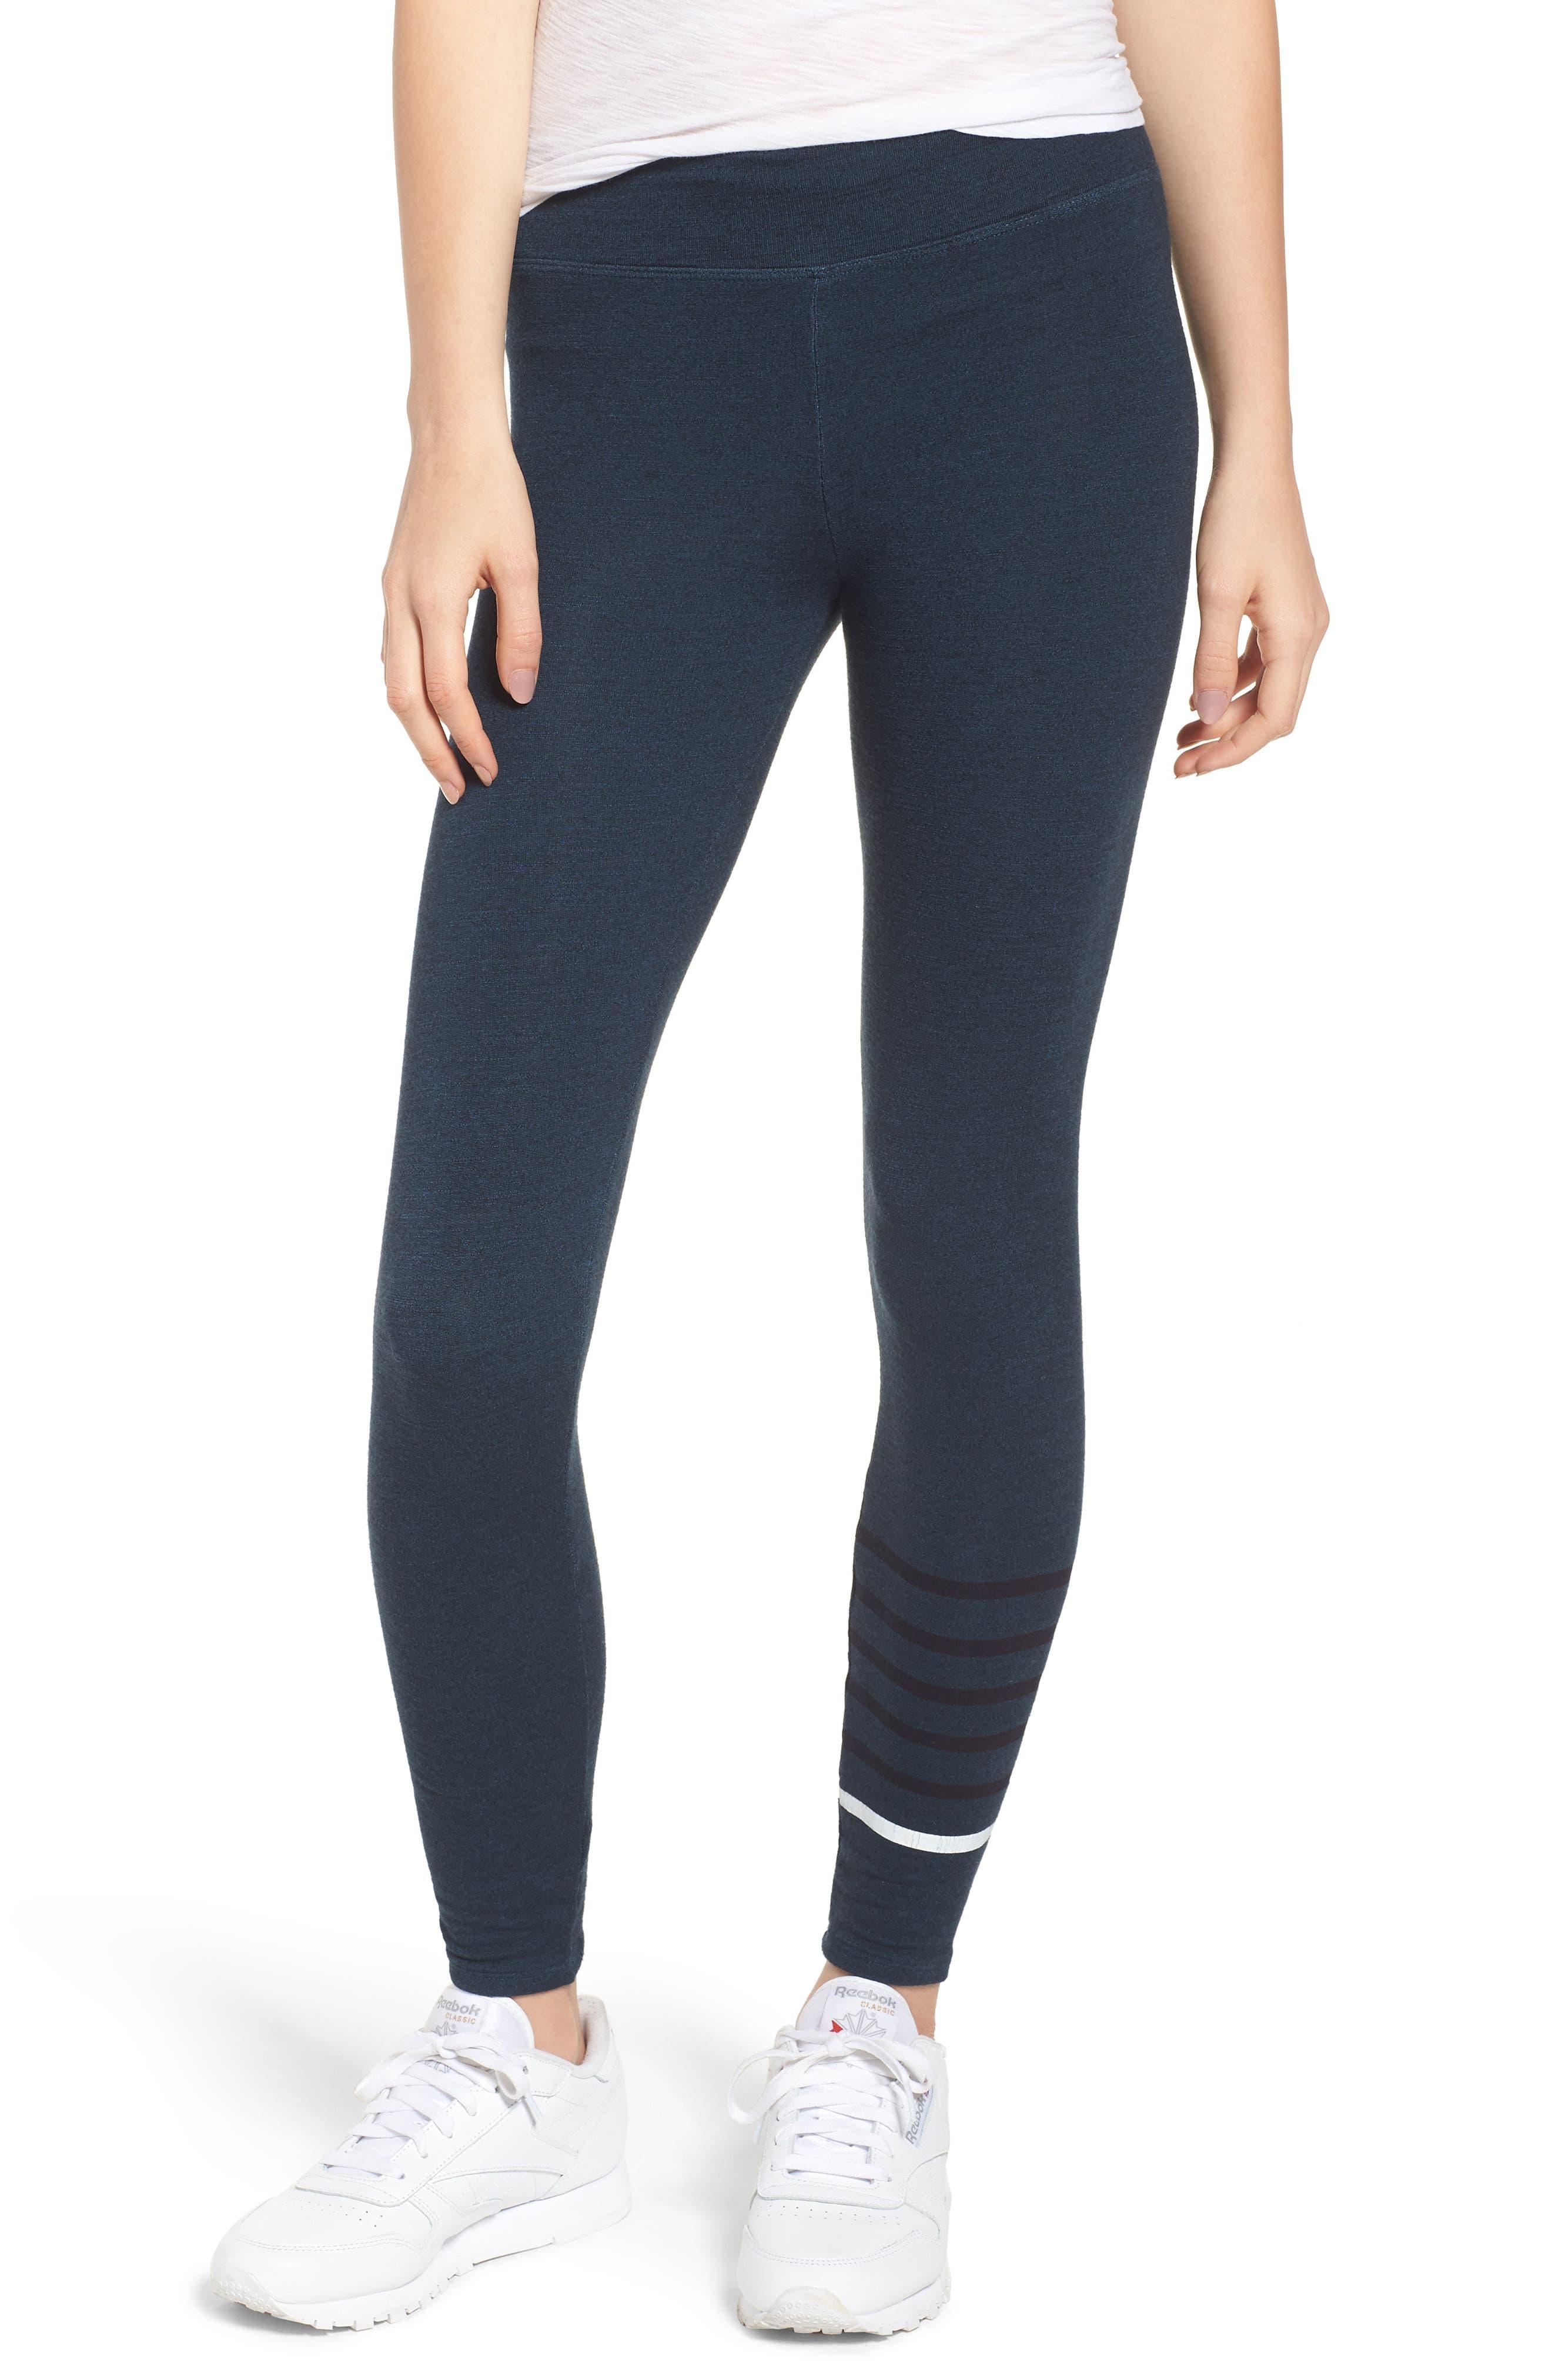 Stripe Yoga Pants,                             Main thumbnail 1, color,                             STORM